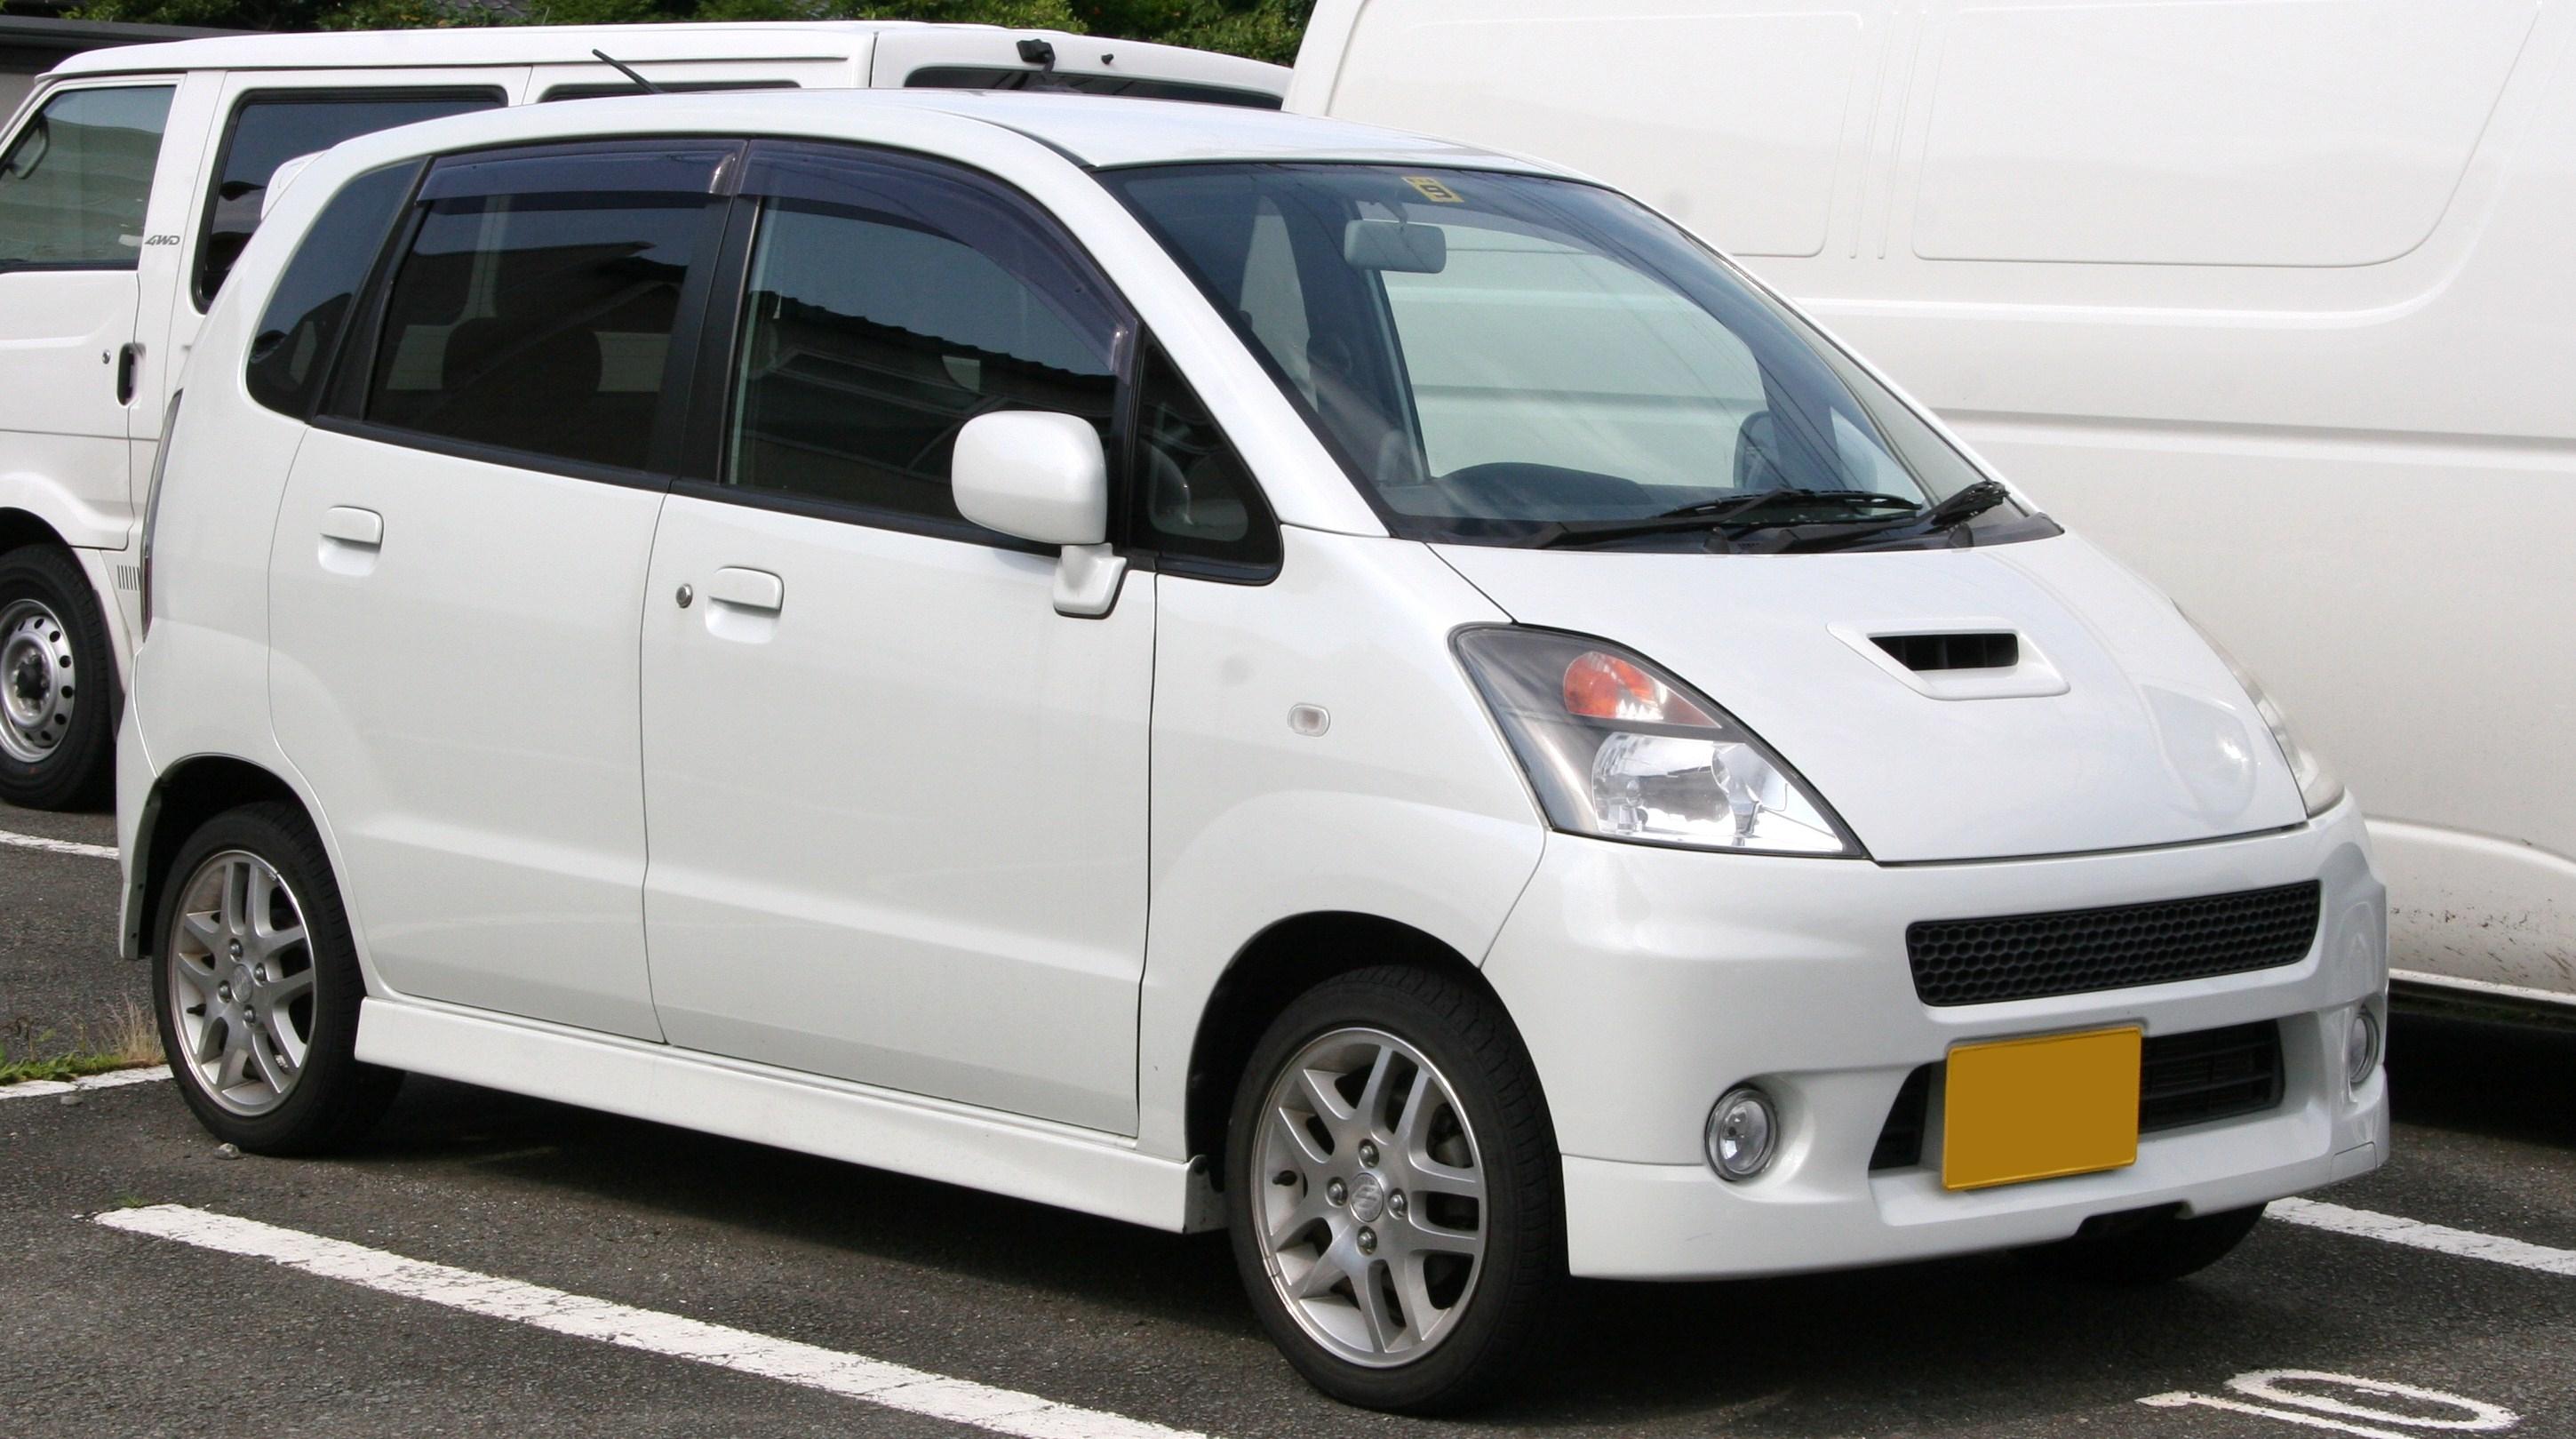 File:Suzuki MR Wagon Sport.jpg - Wikimedia Commons